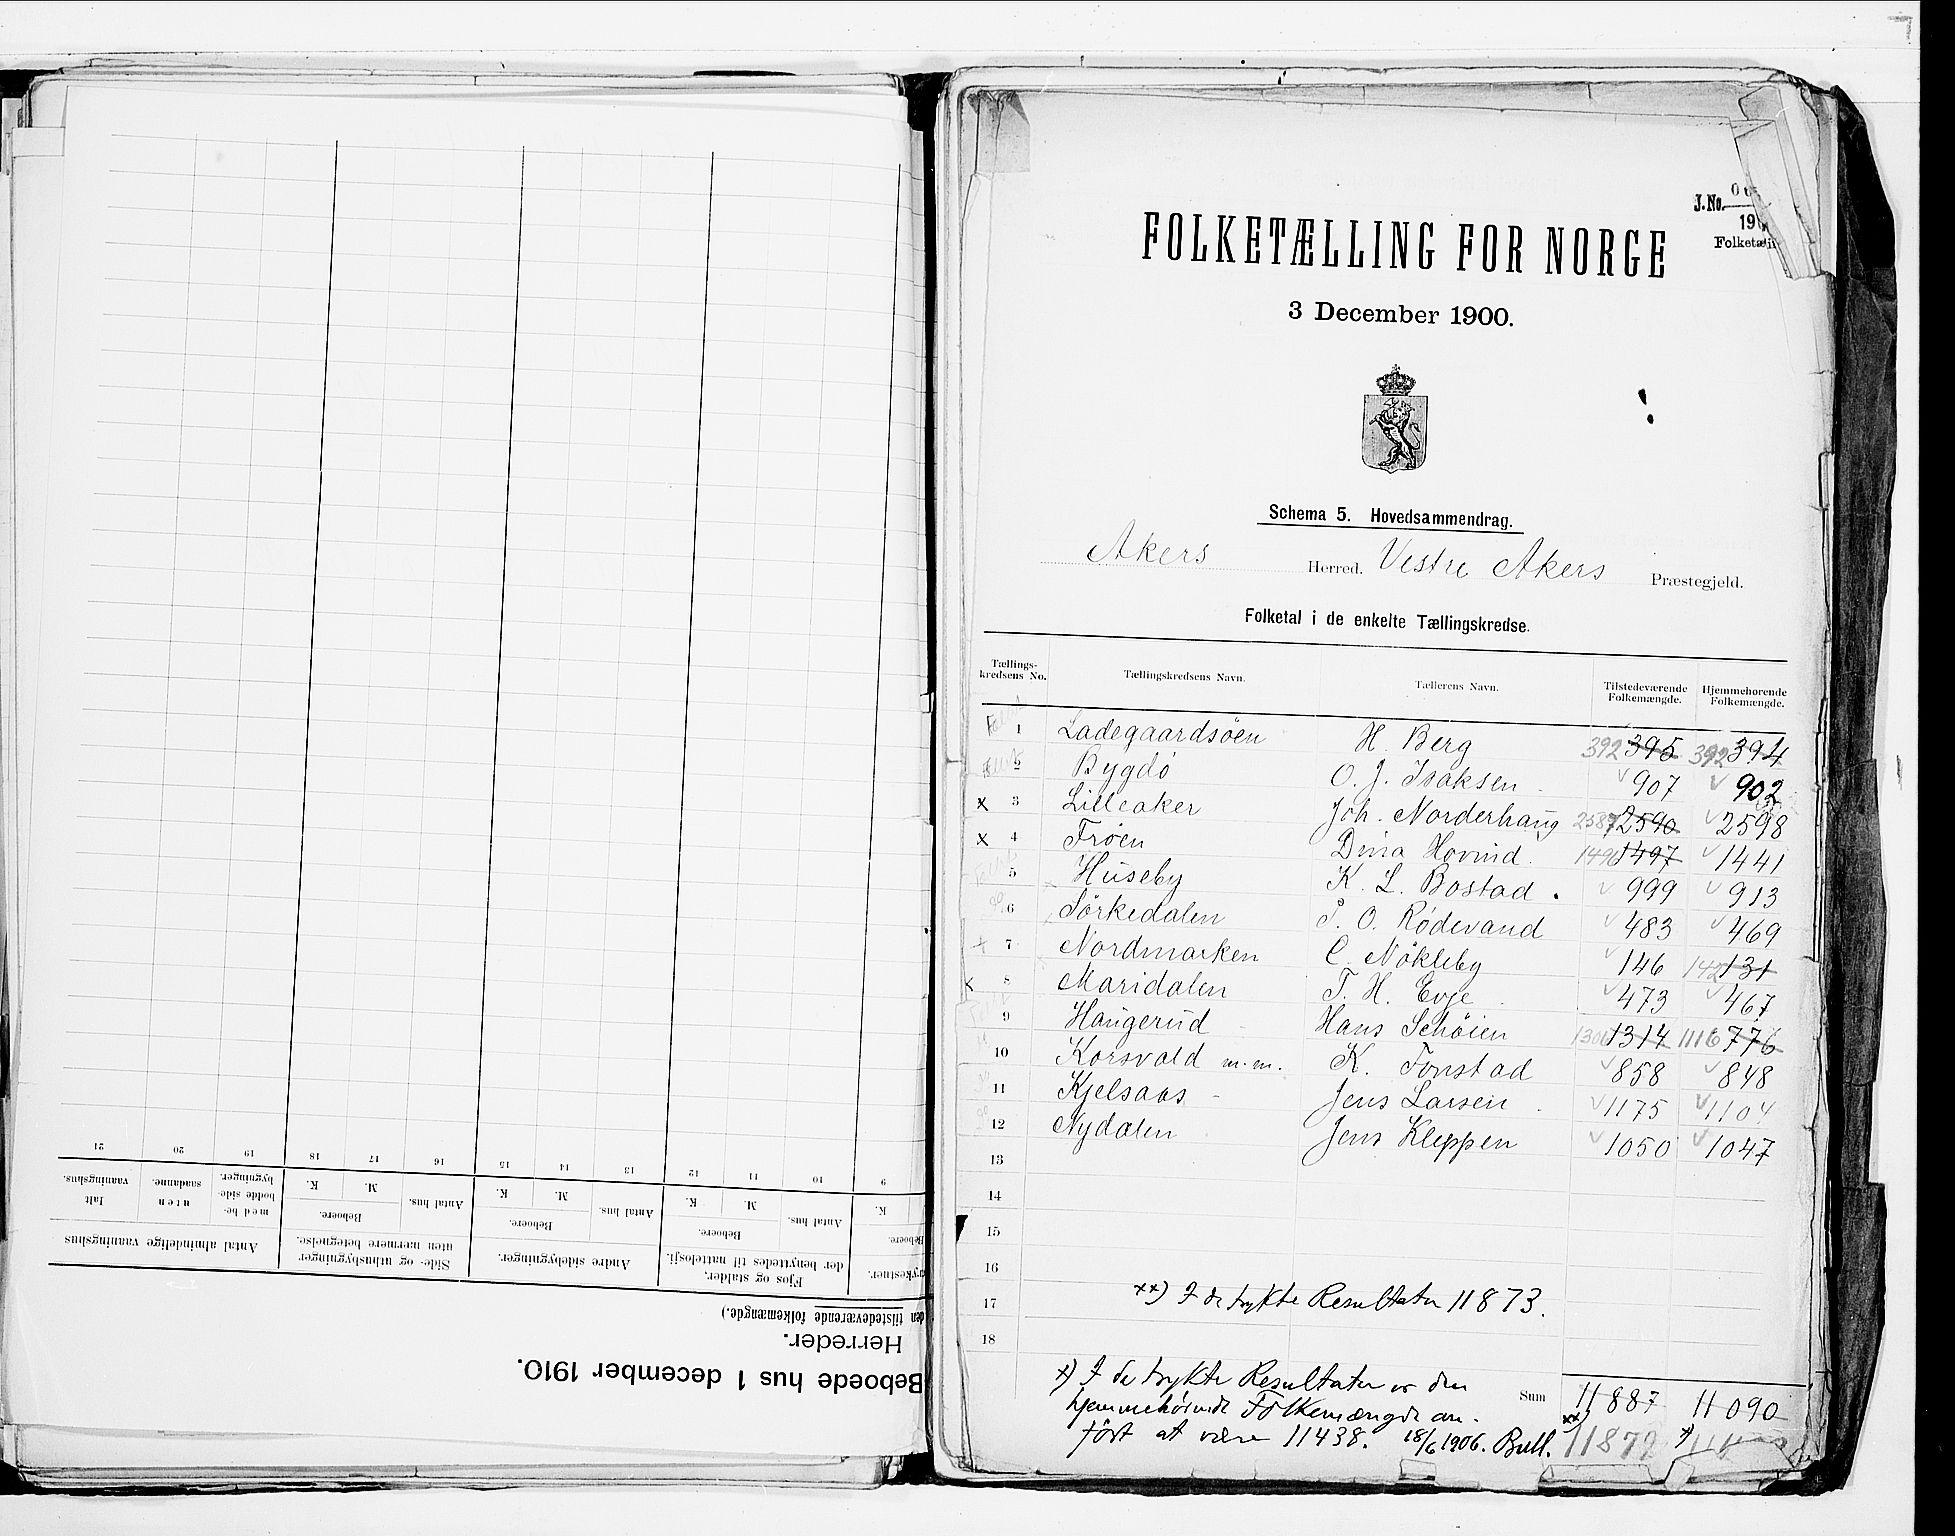 SAO, 1900 census for Aker, 1900, p. 38